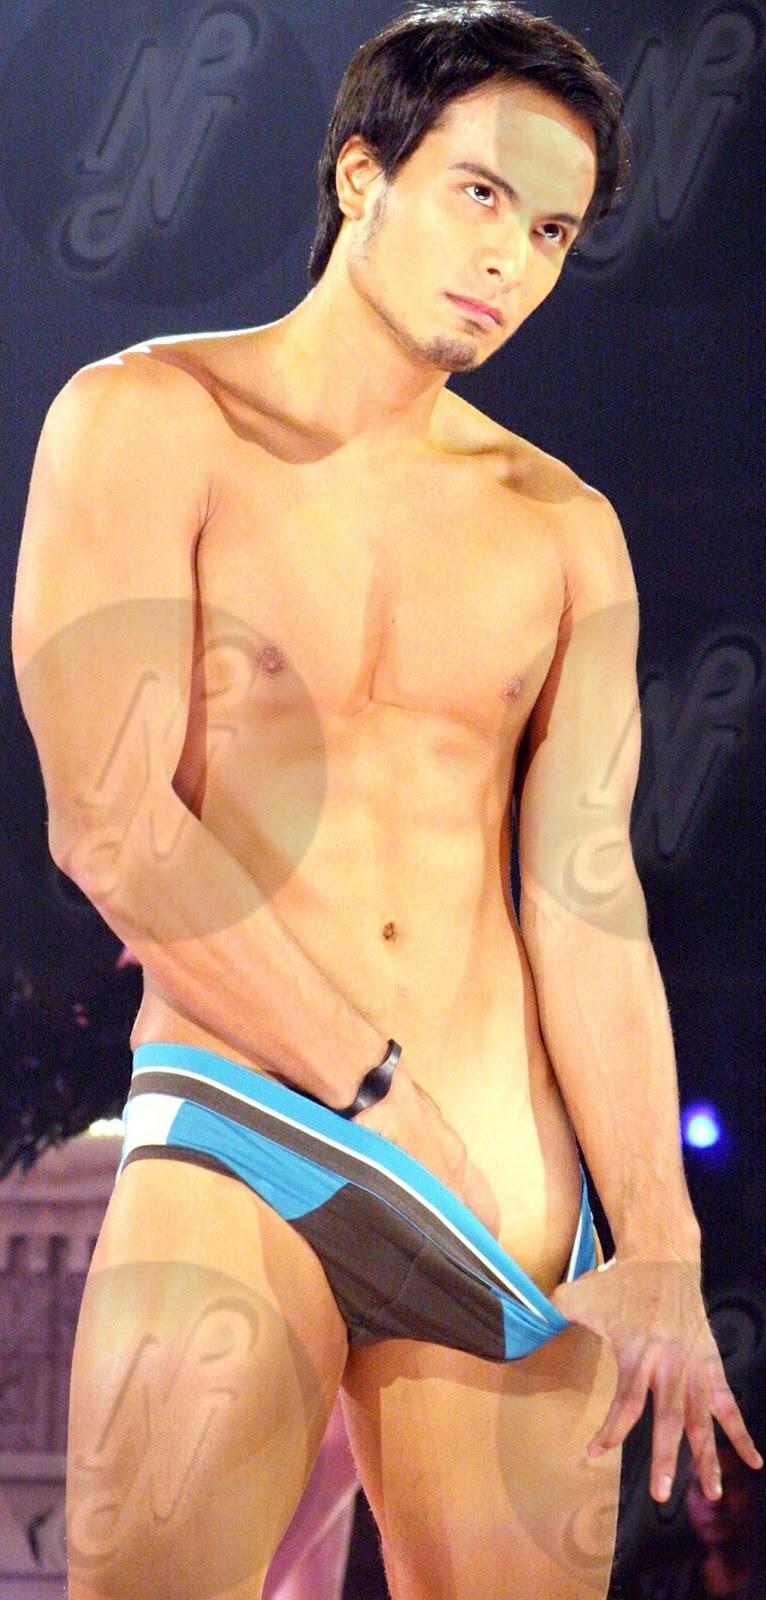 Rafael rosell iv nude